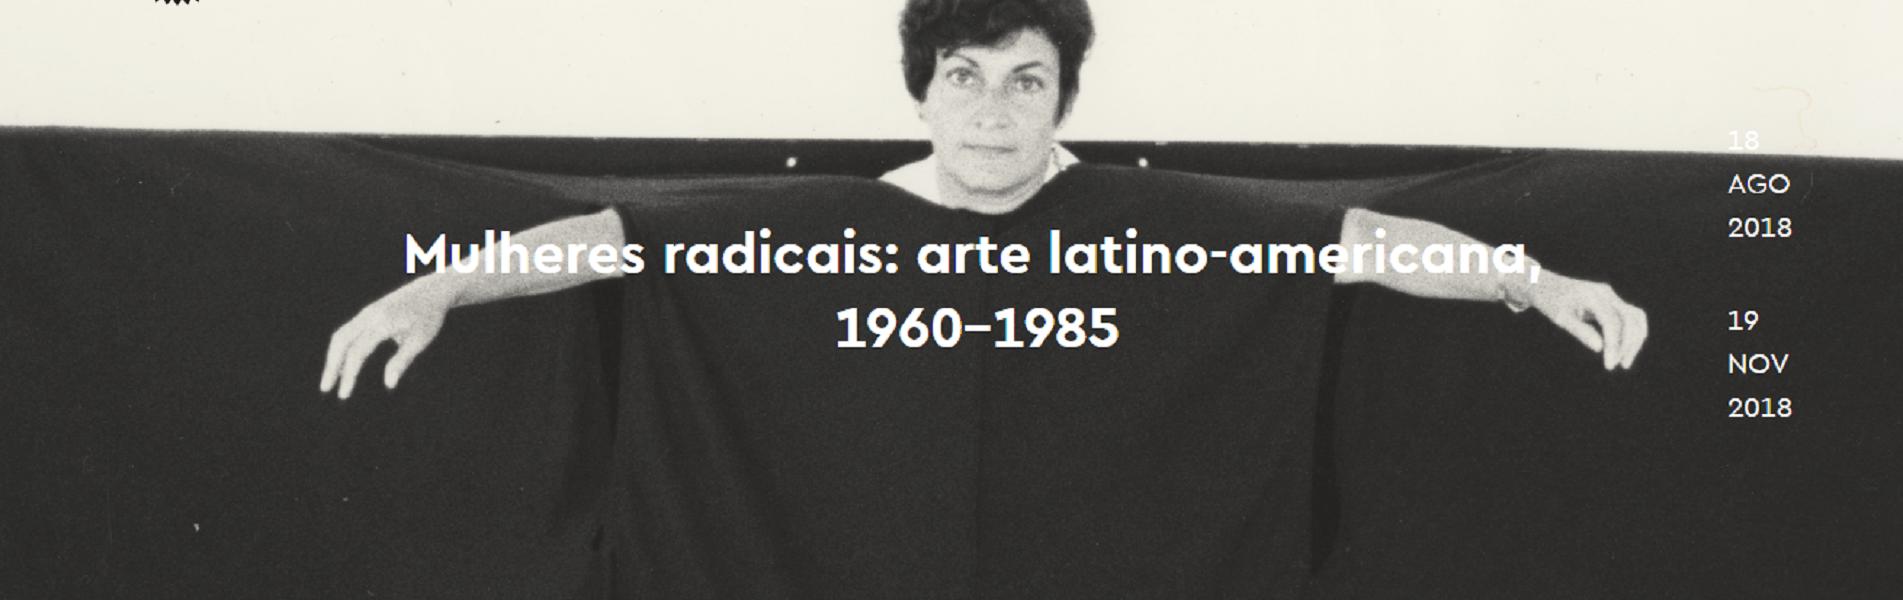 mulheres-radicais-pinacoteca.png